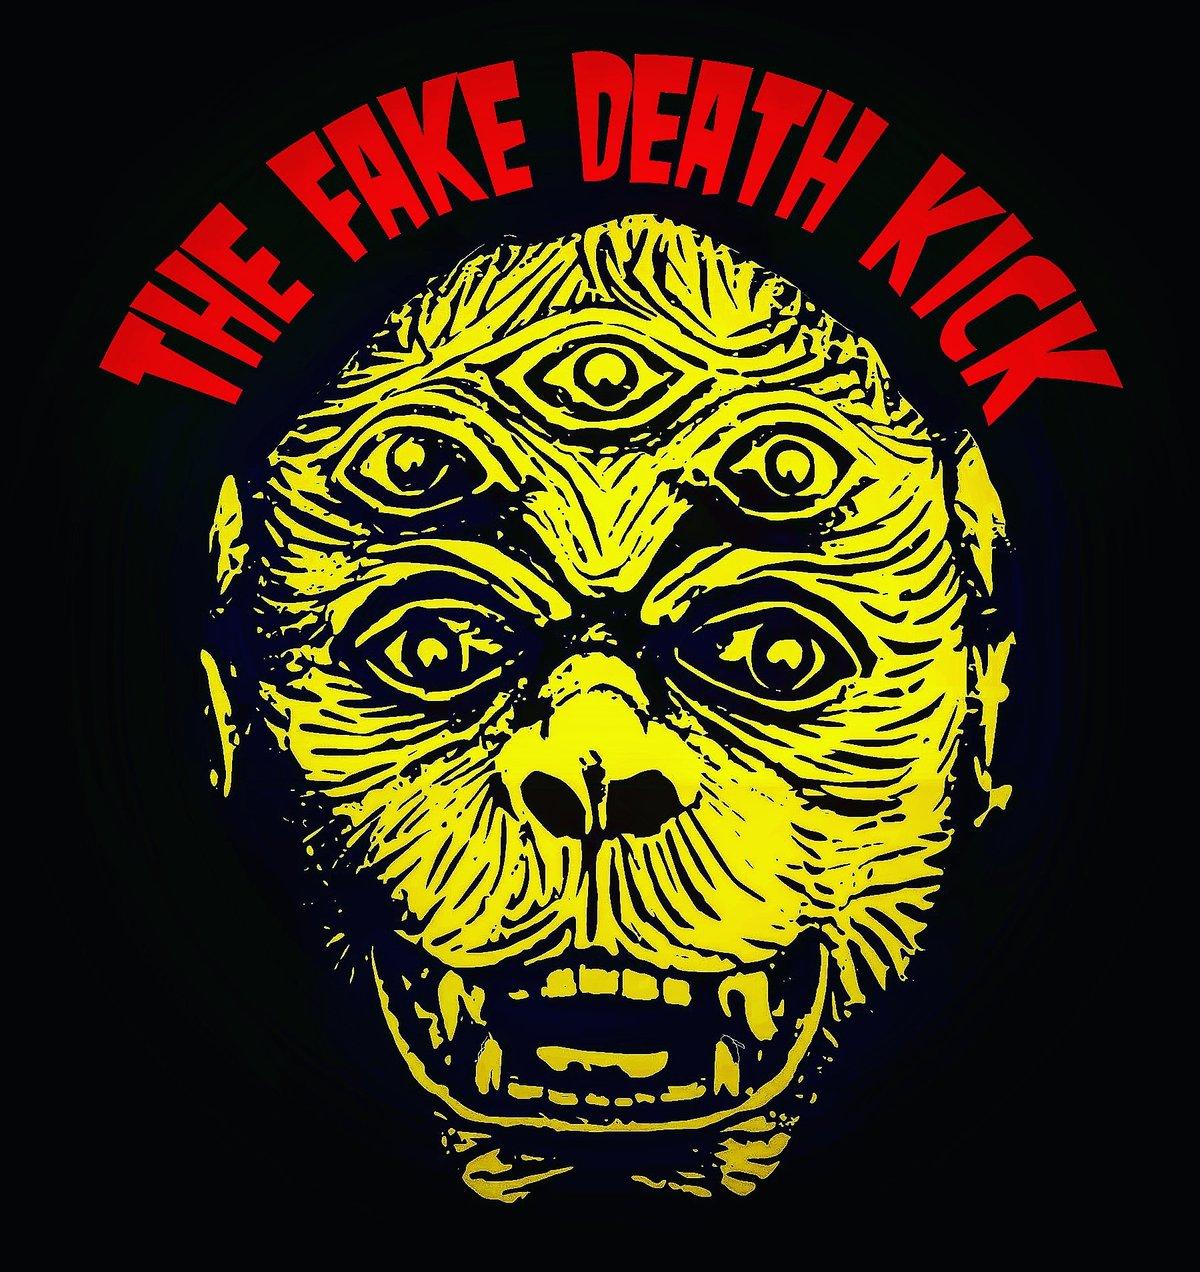 FAKE DEATH KICK TEE